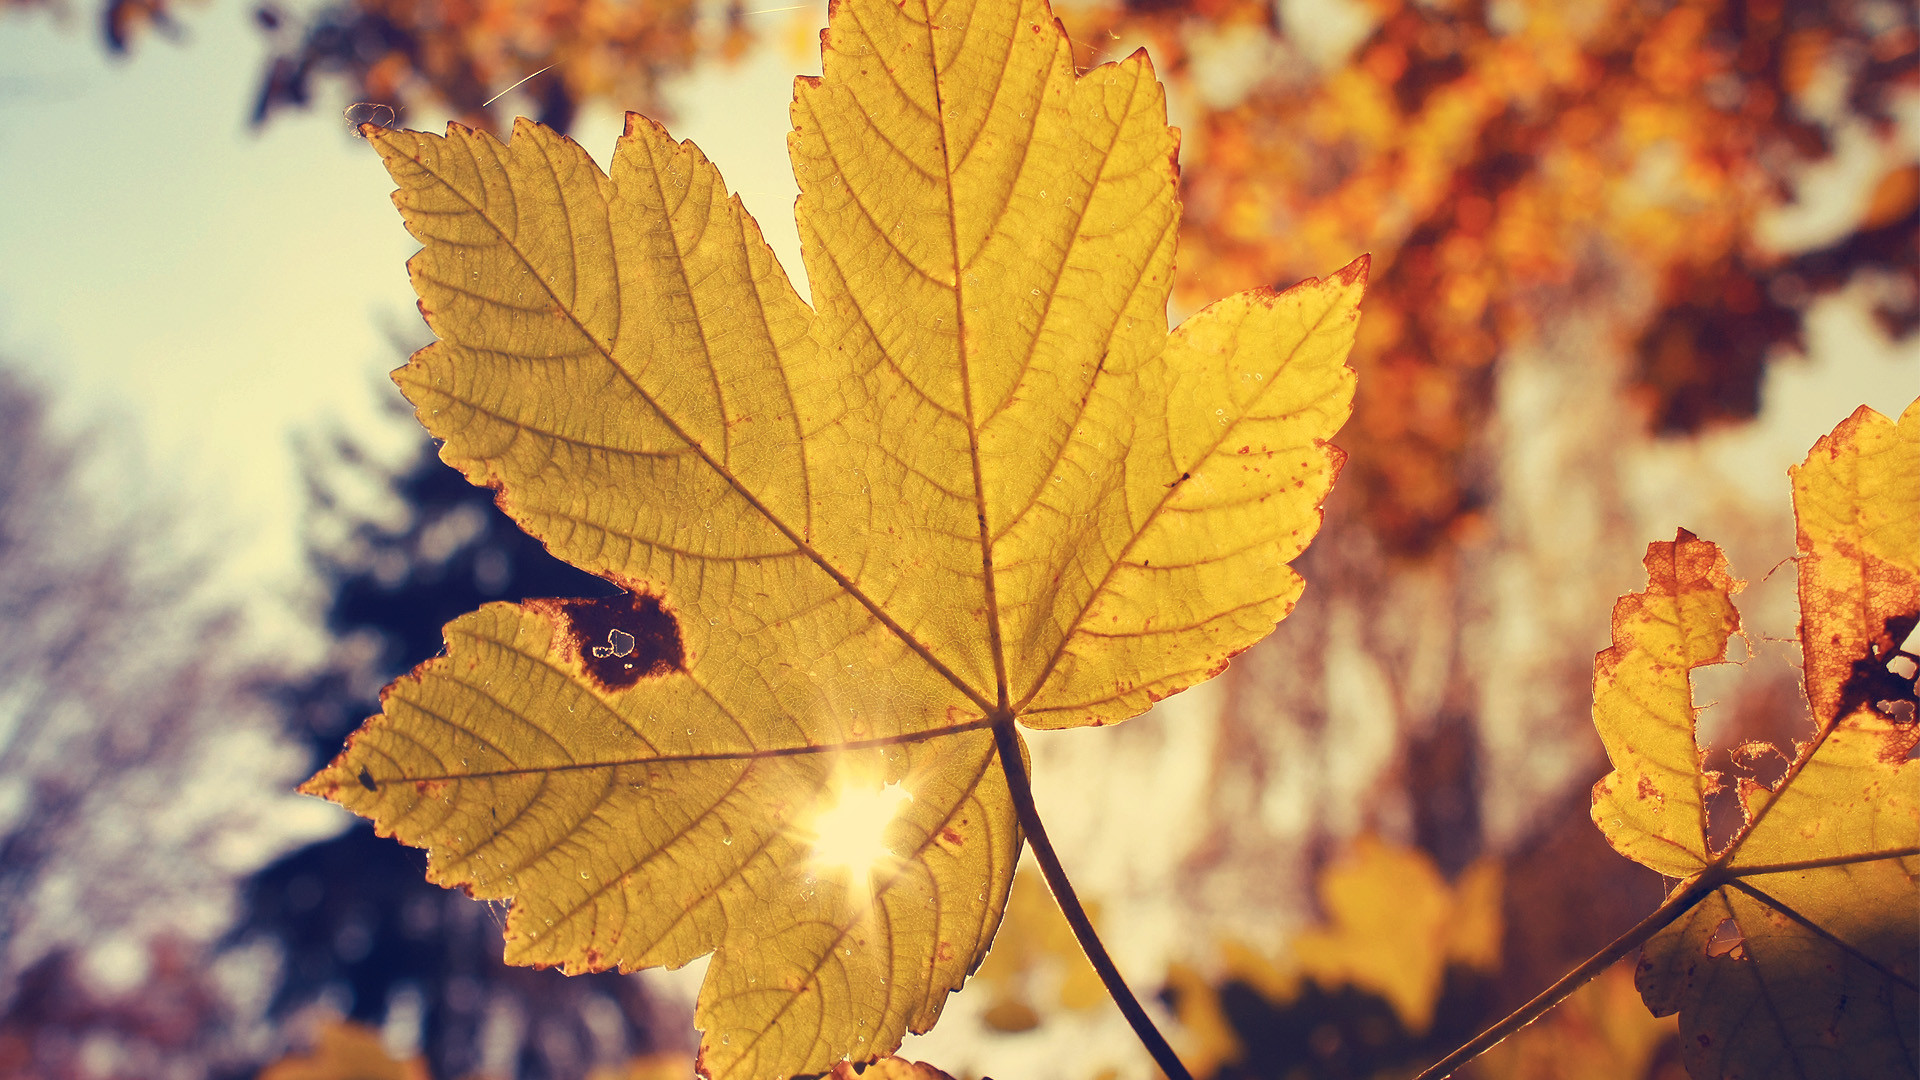 Cute Fall Wallpaper Backgrounds – WallpaperSafari